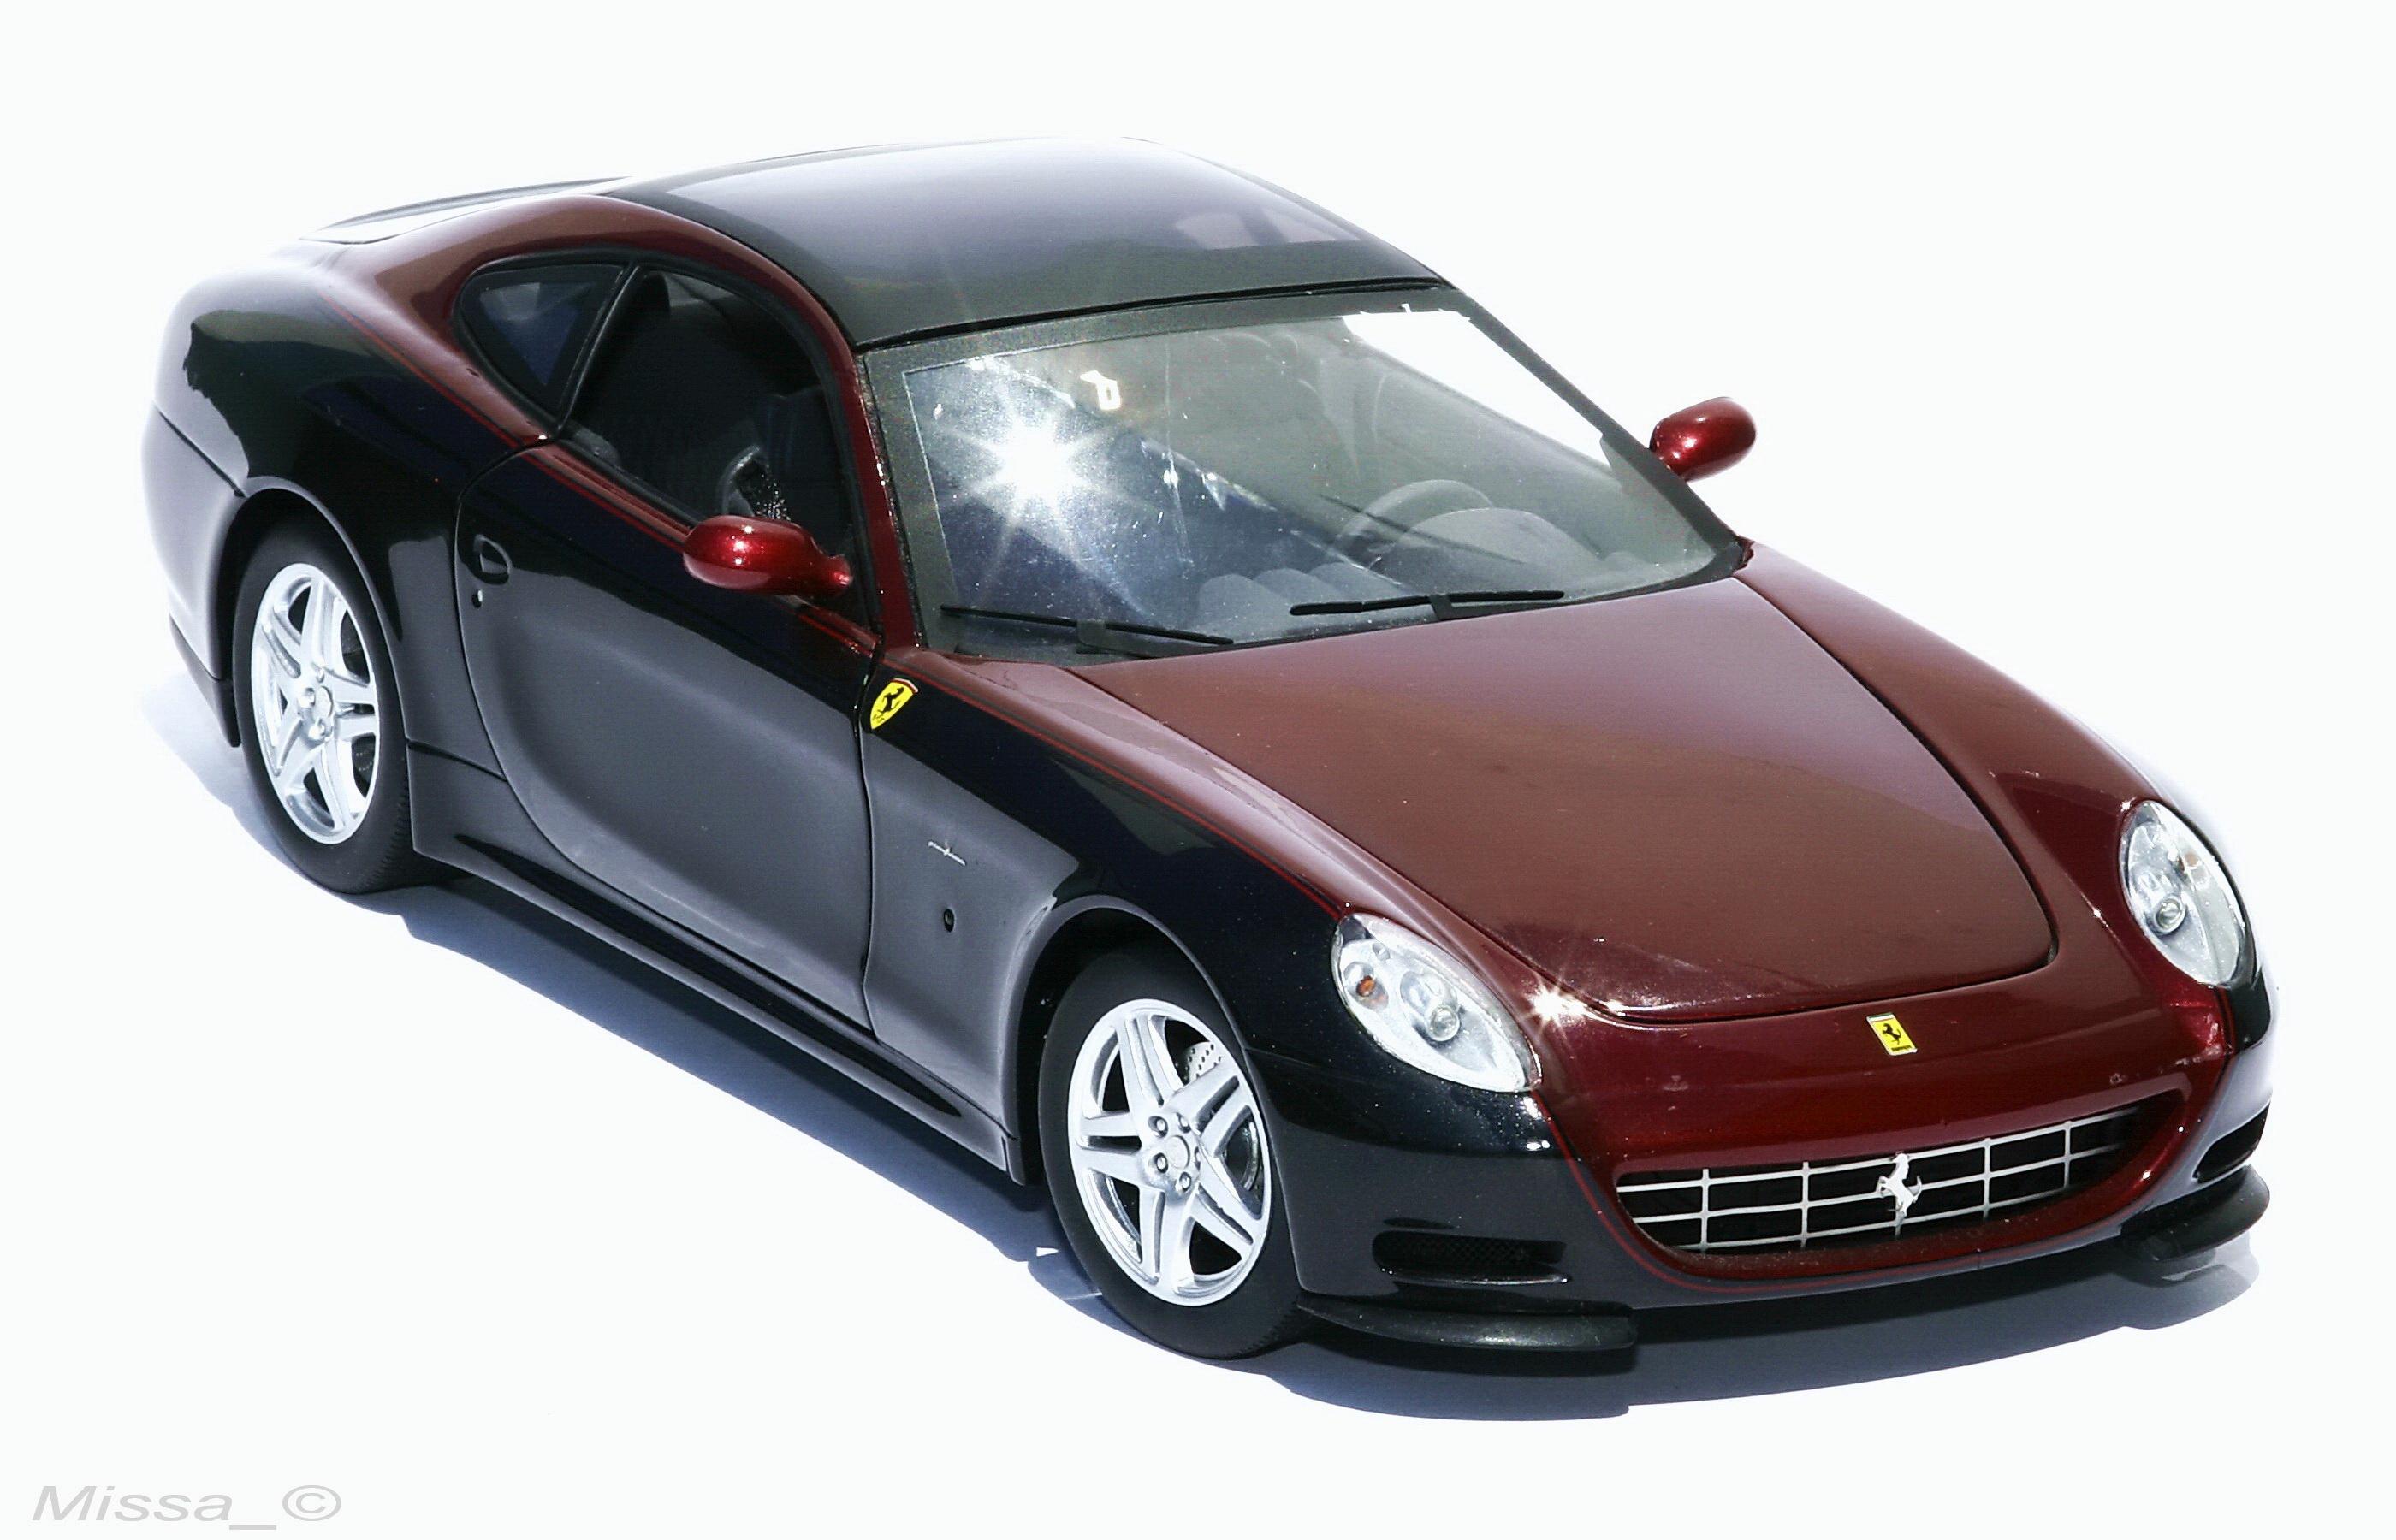 002_elite_ferrari612sgsx38 Fabulous Ferrari Mondial 8 Super Elite Cars Trend